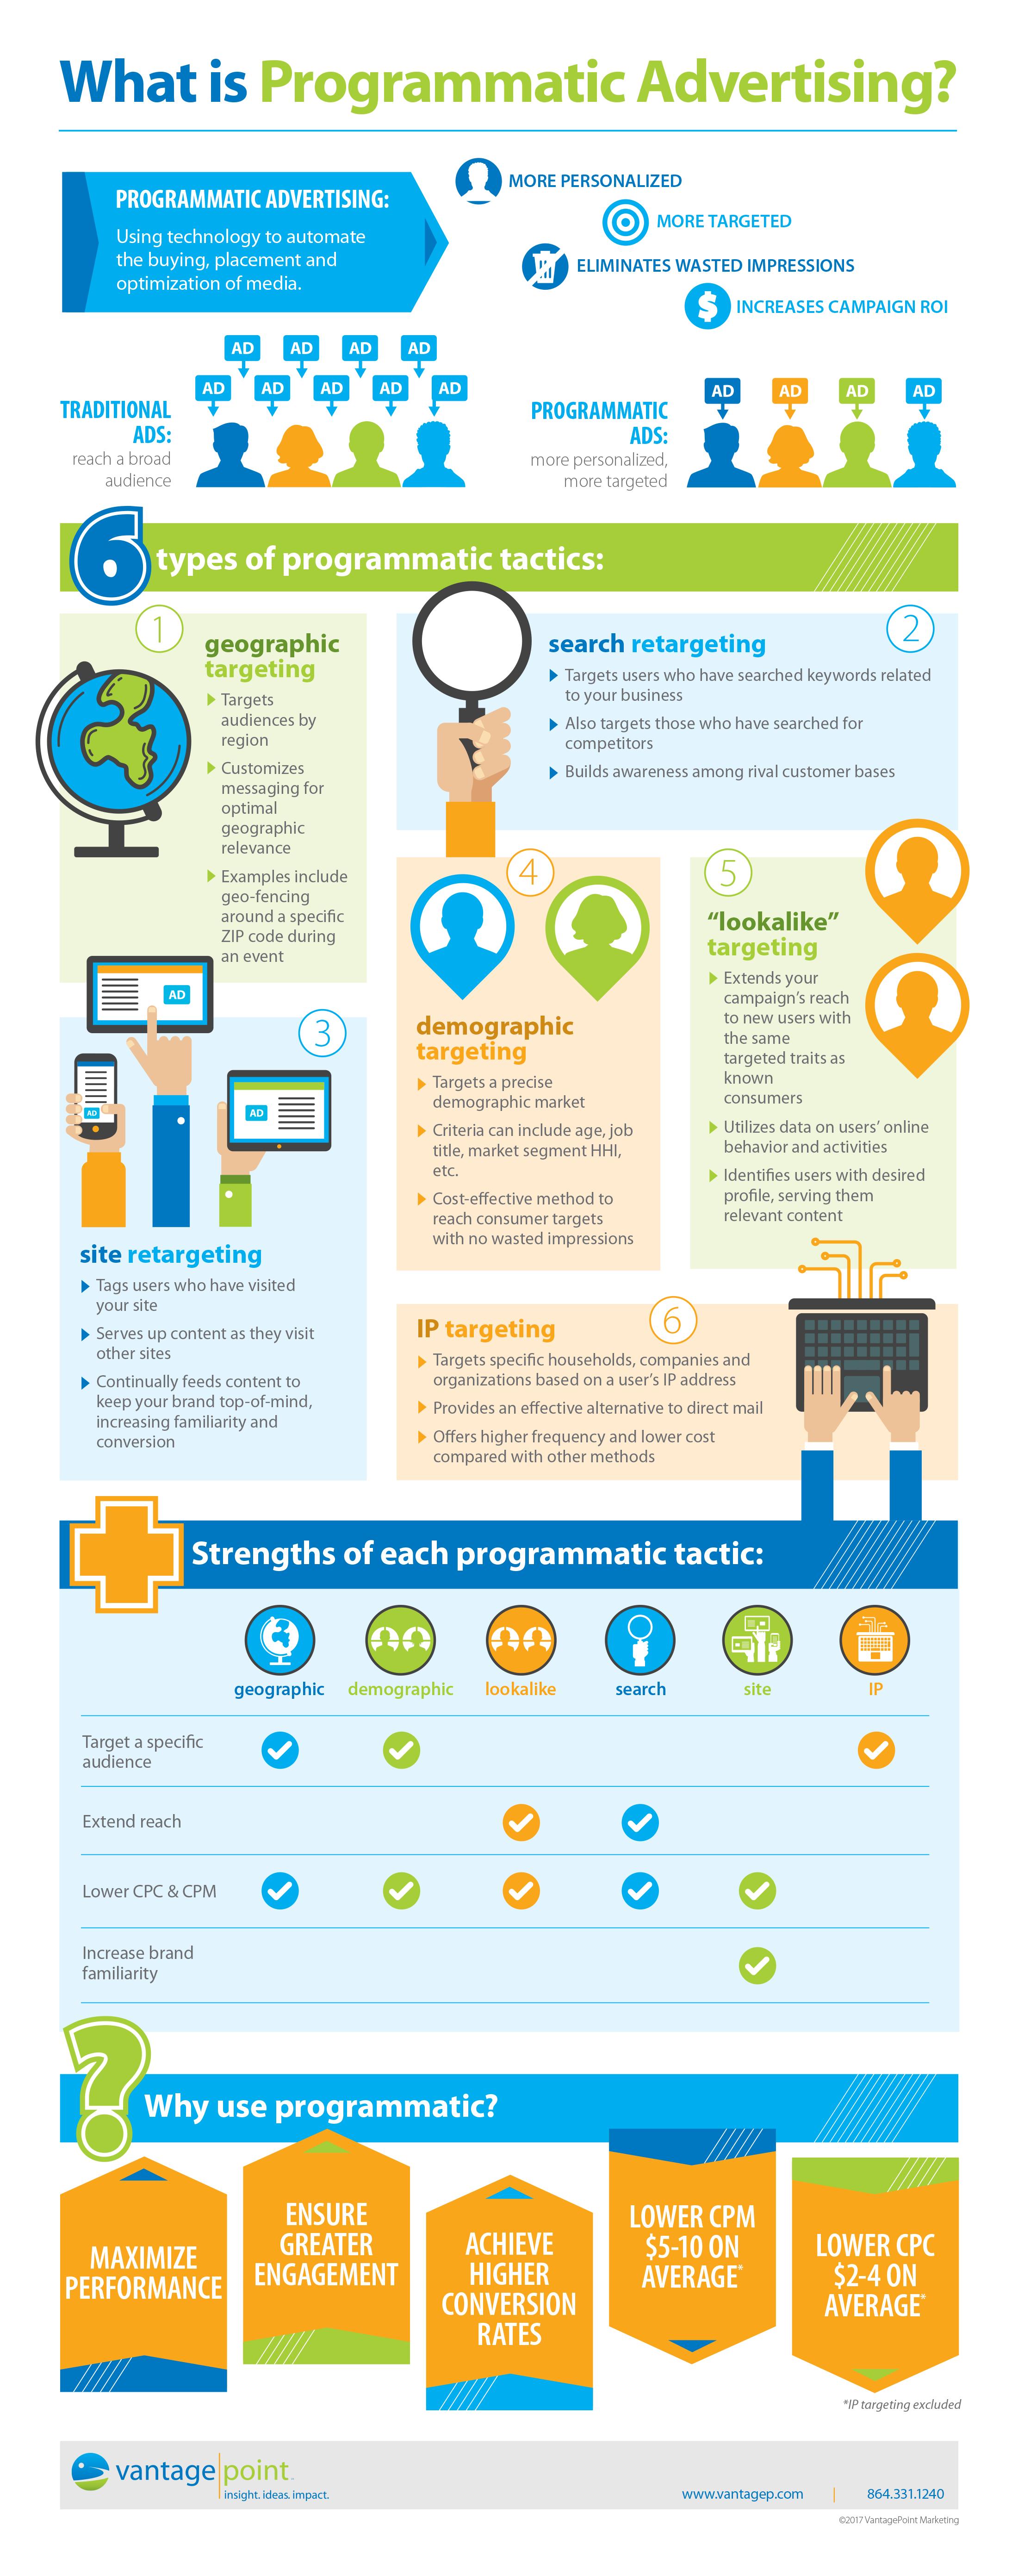 VantagePoint Marketing Programmatic advertising infographic